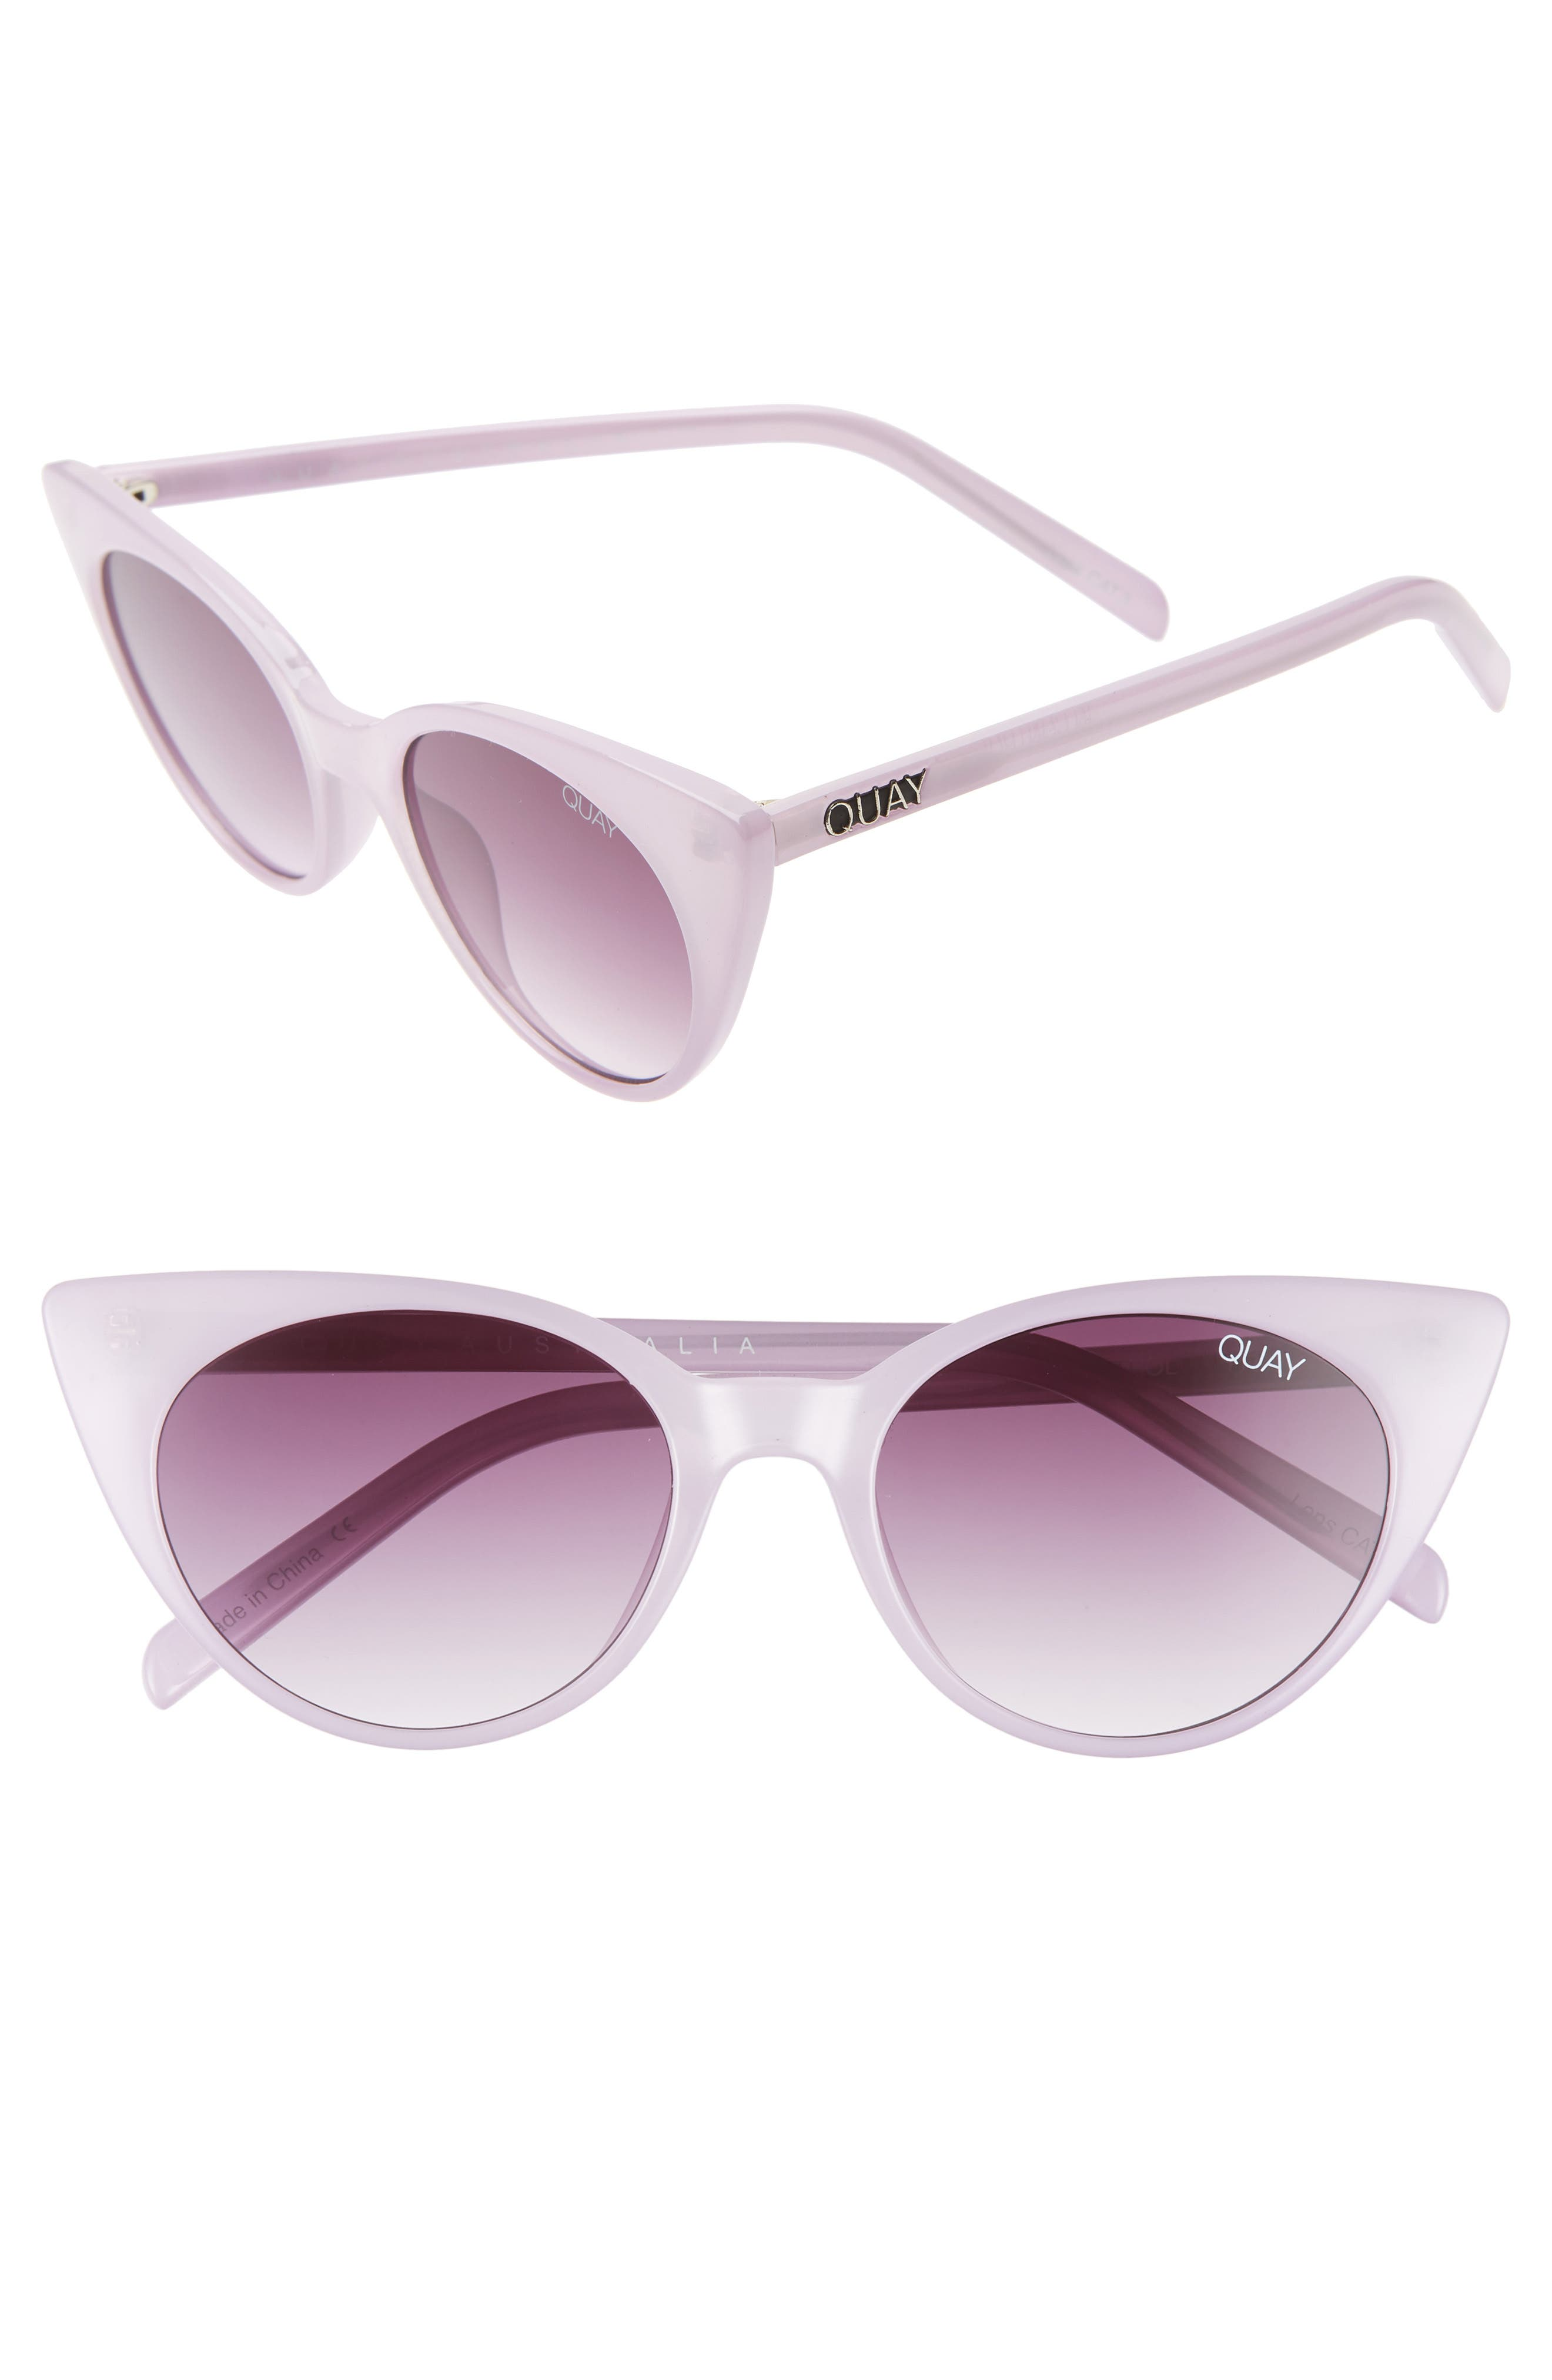 b95427adbdc1f Quay Australia Aphrodite 5m Cat Eye Sunglasses - Violet  Purple Fade